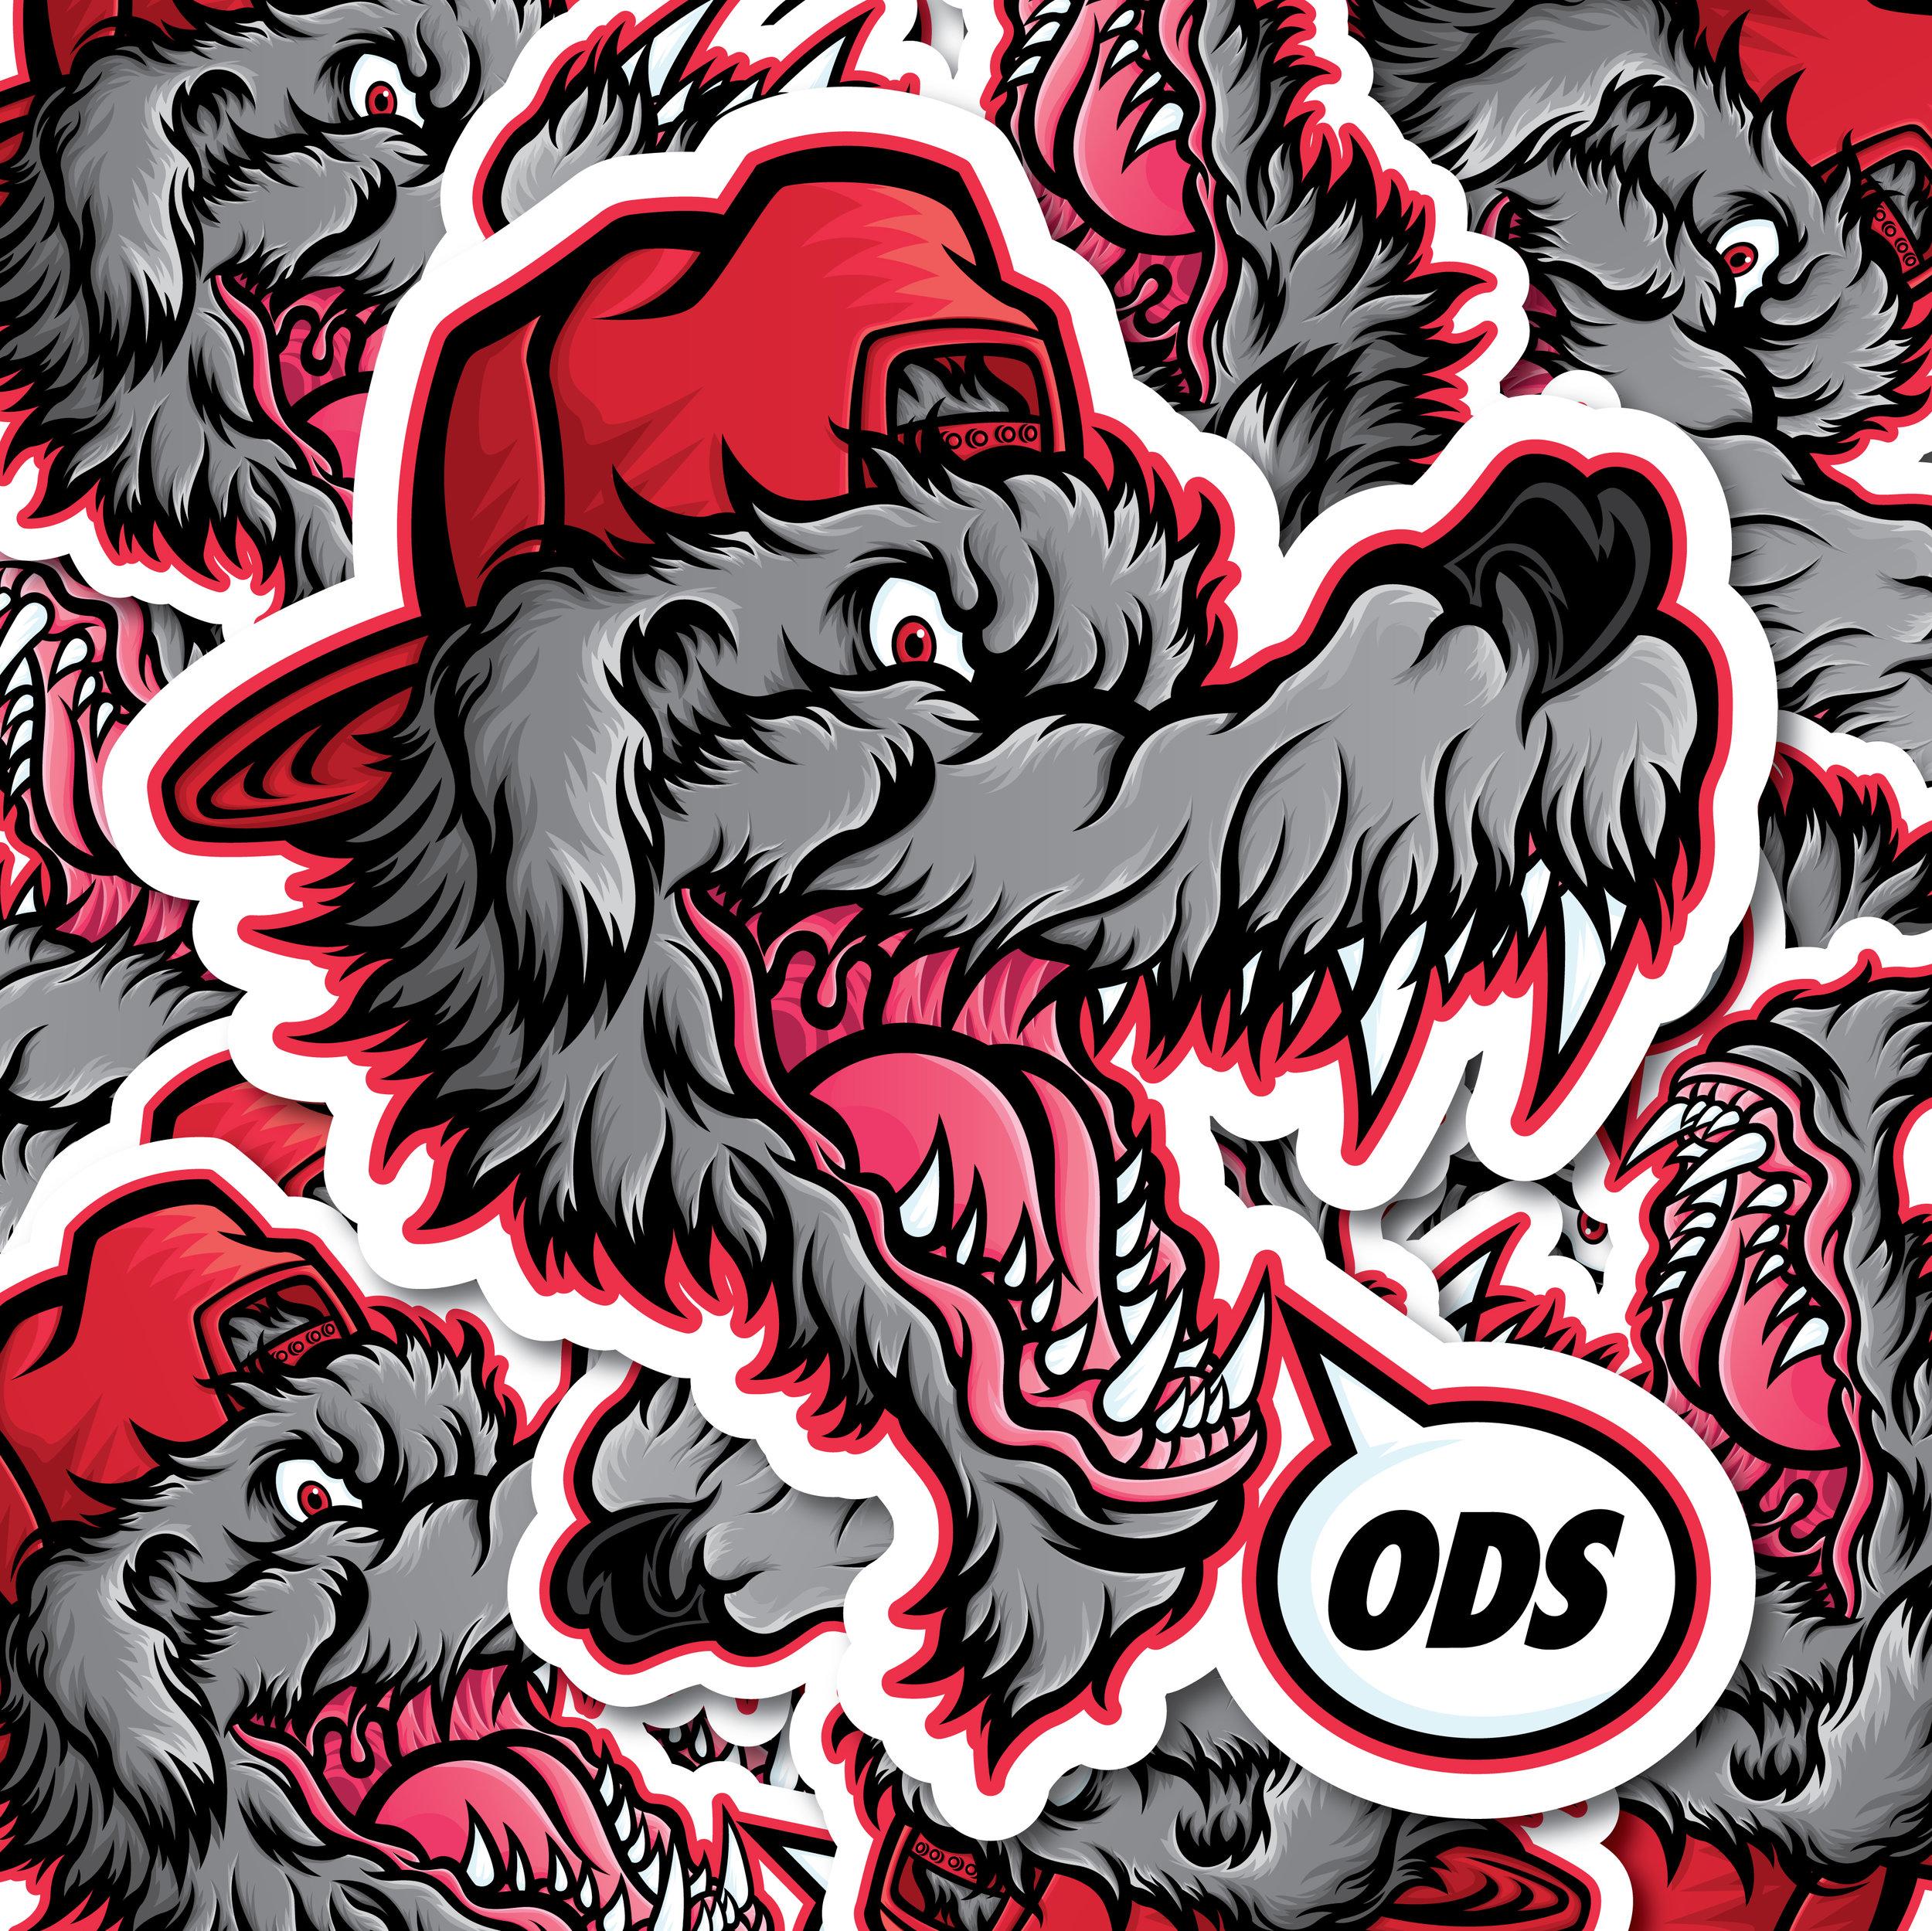 ODS-Dog-orozcodesign.jpg